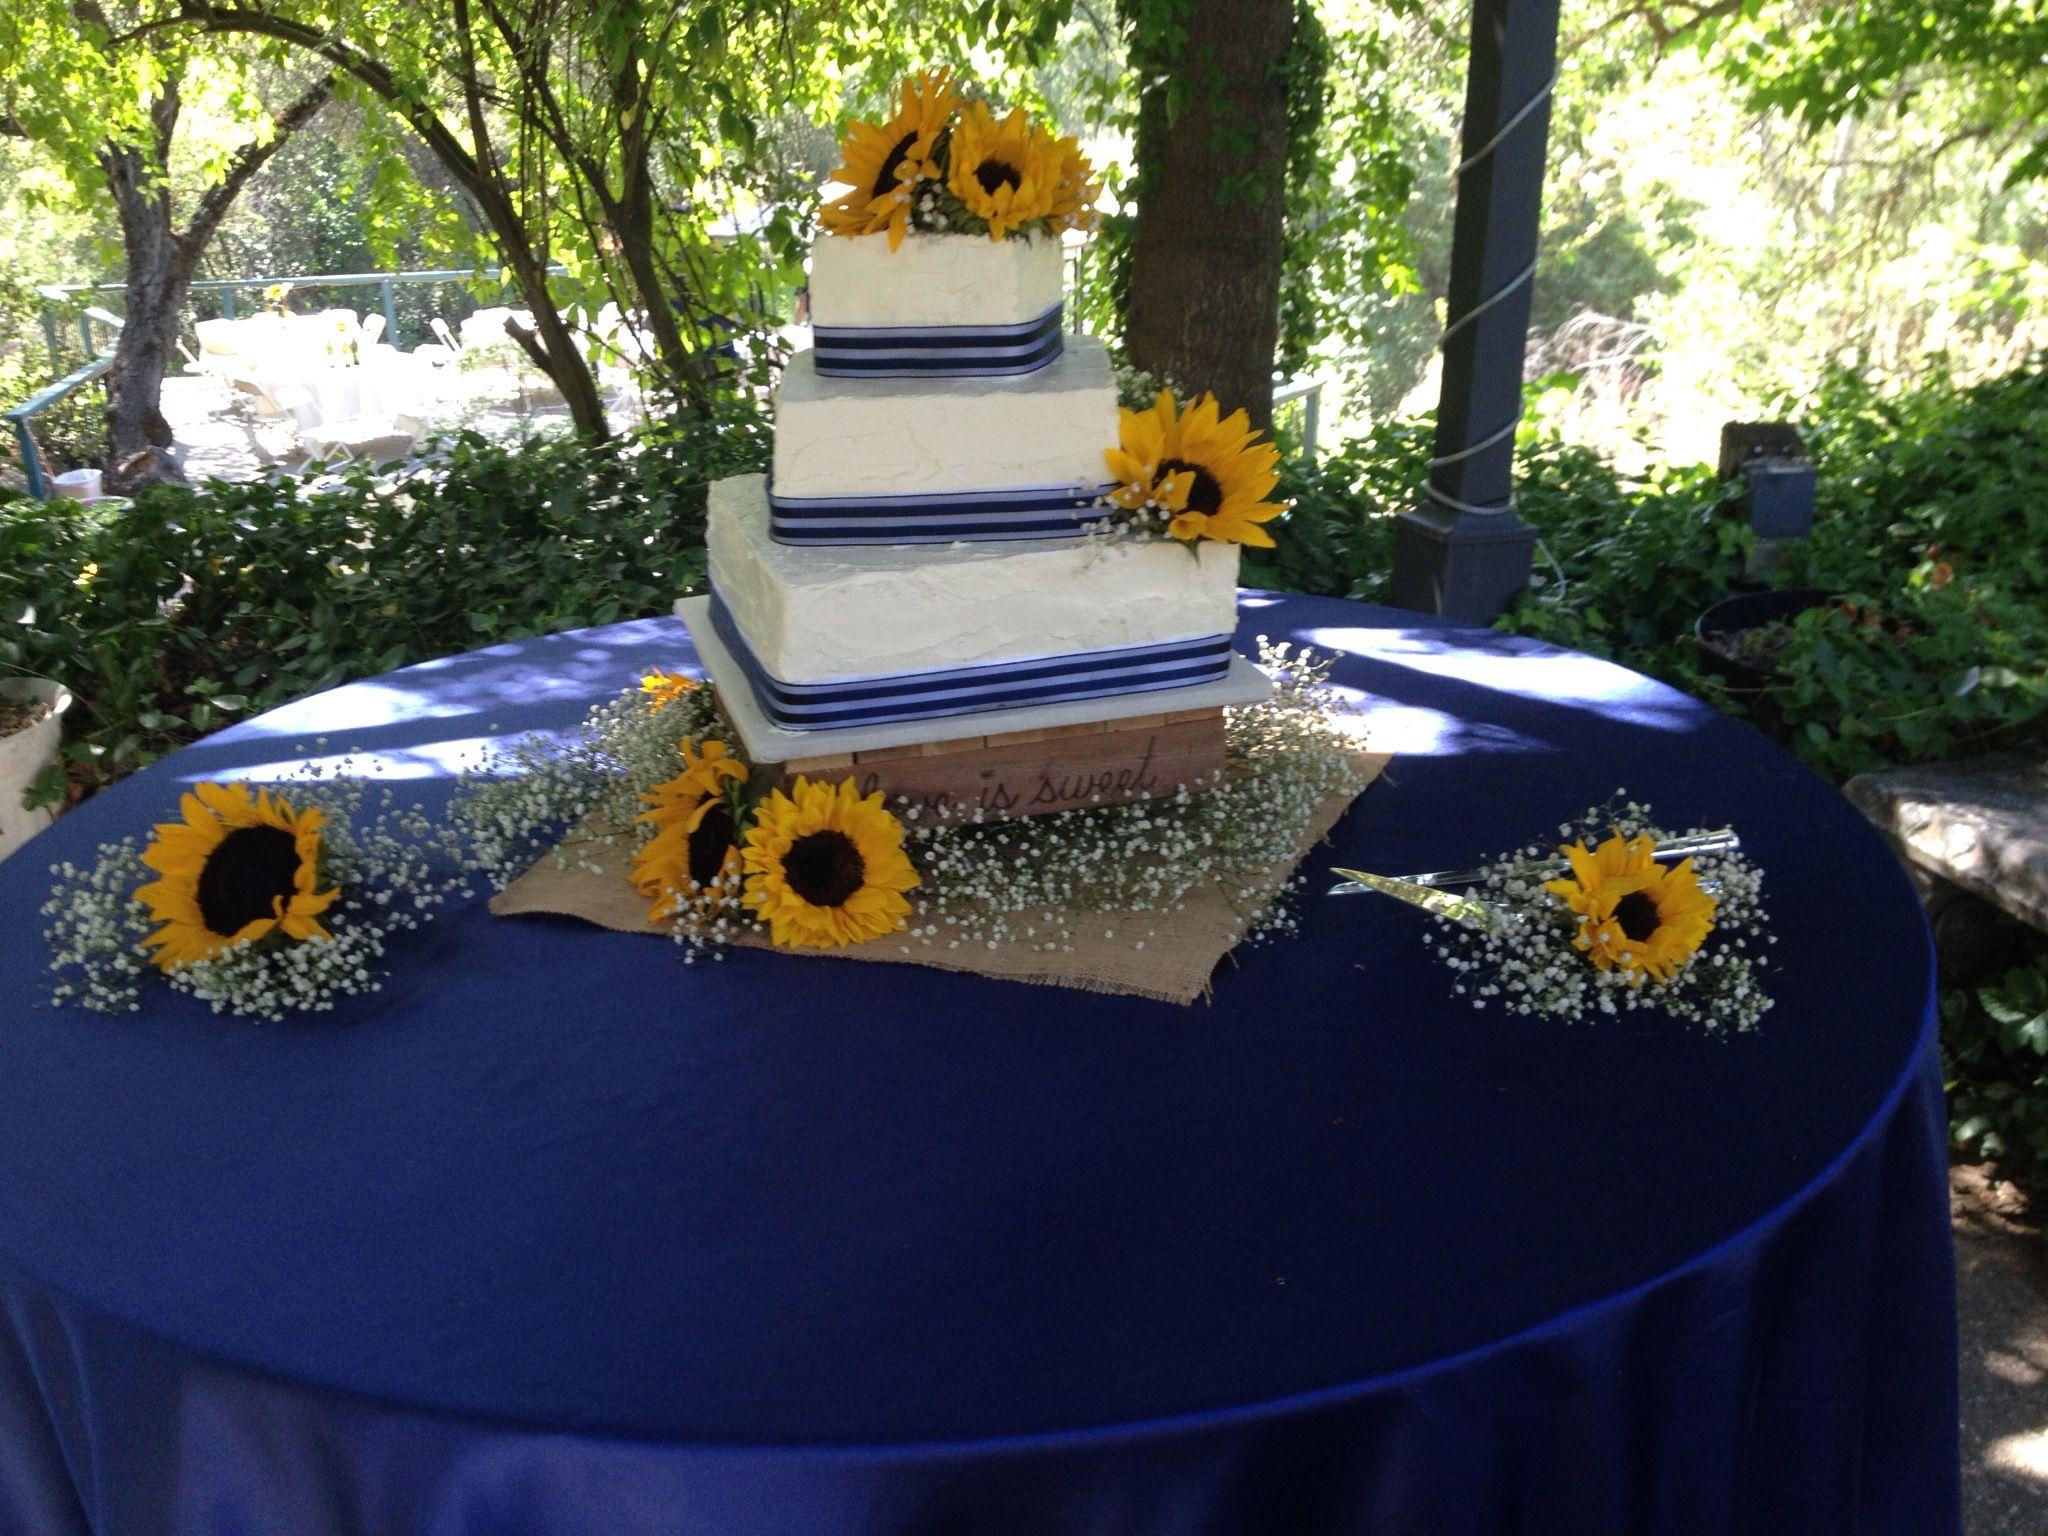 Sunflower and cobalt blue wedding cake